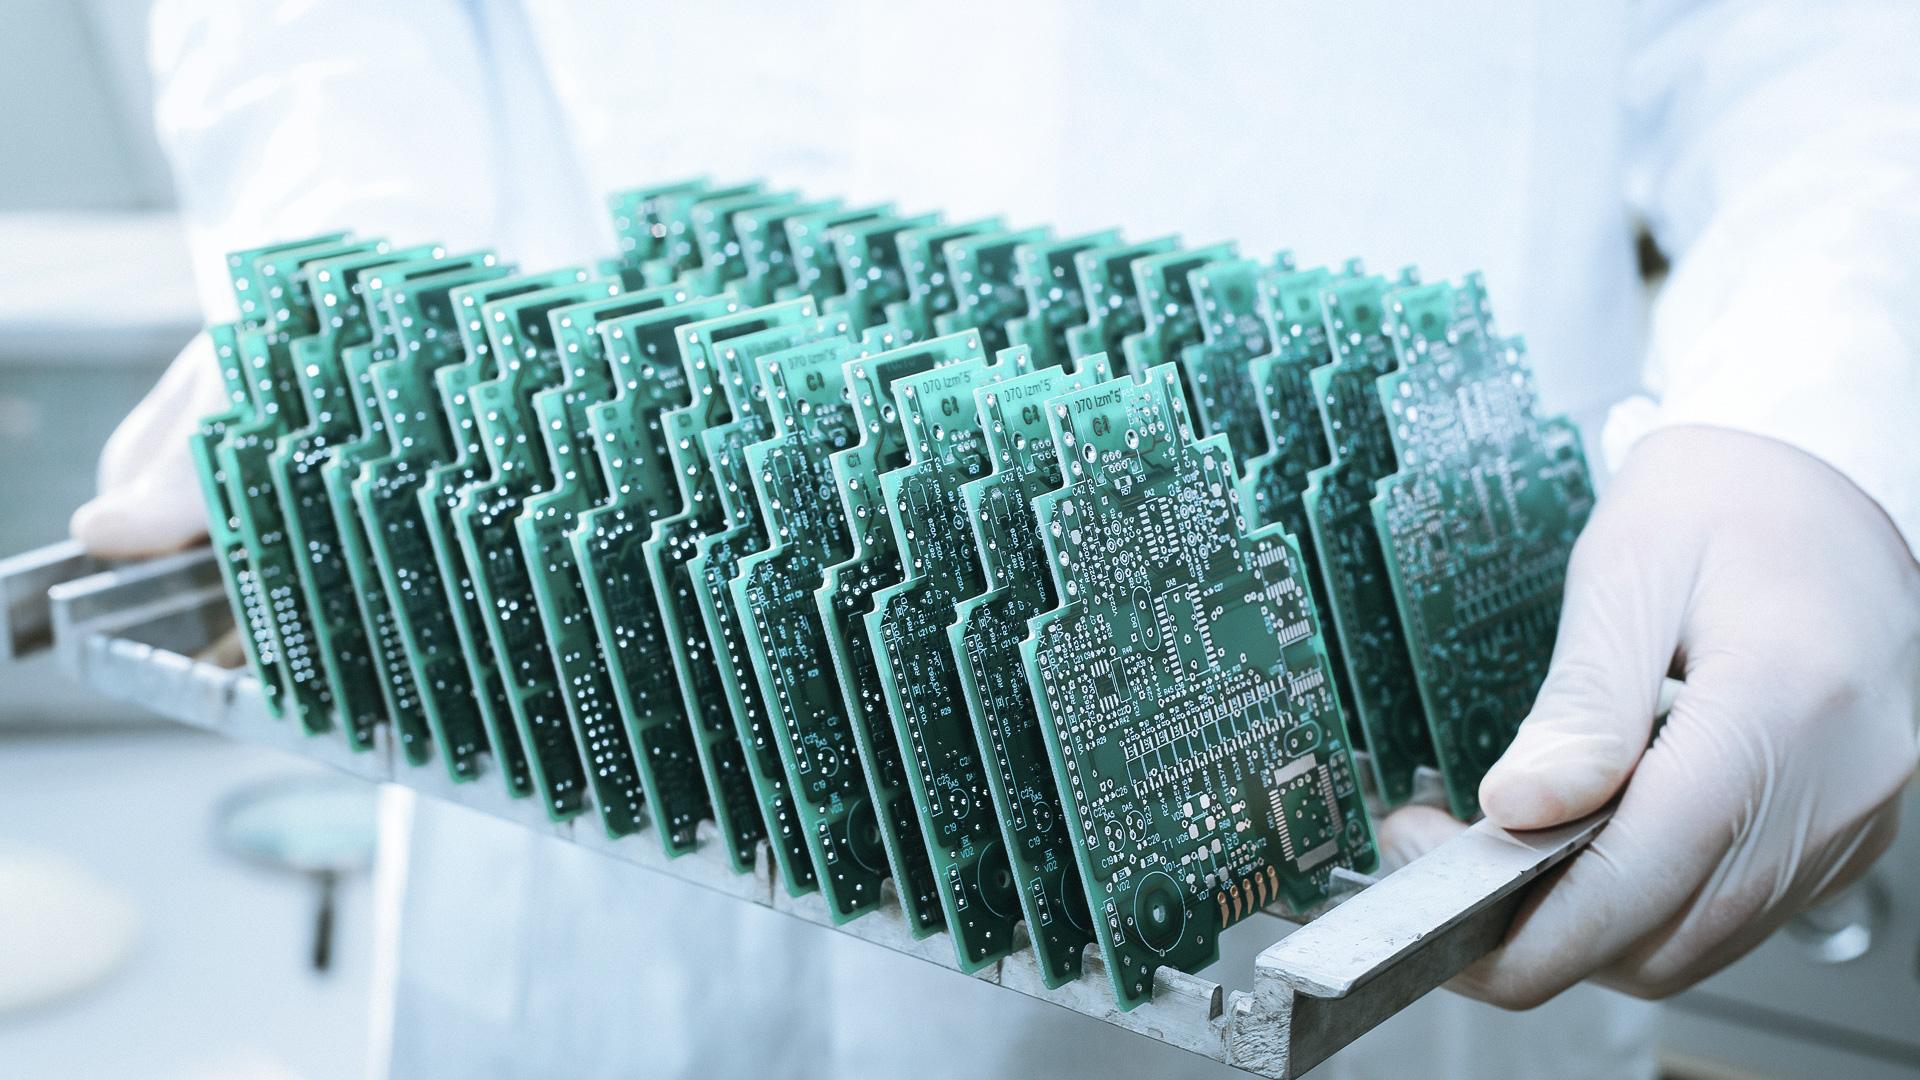 Printed Circuit Board Test Testing Pcb Design Protype Pcb Proto Board